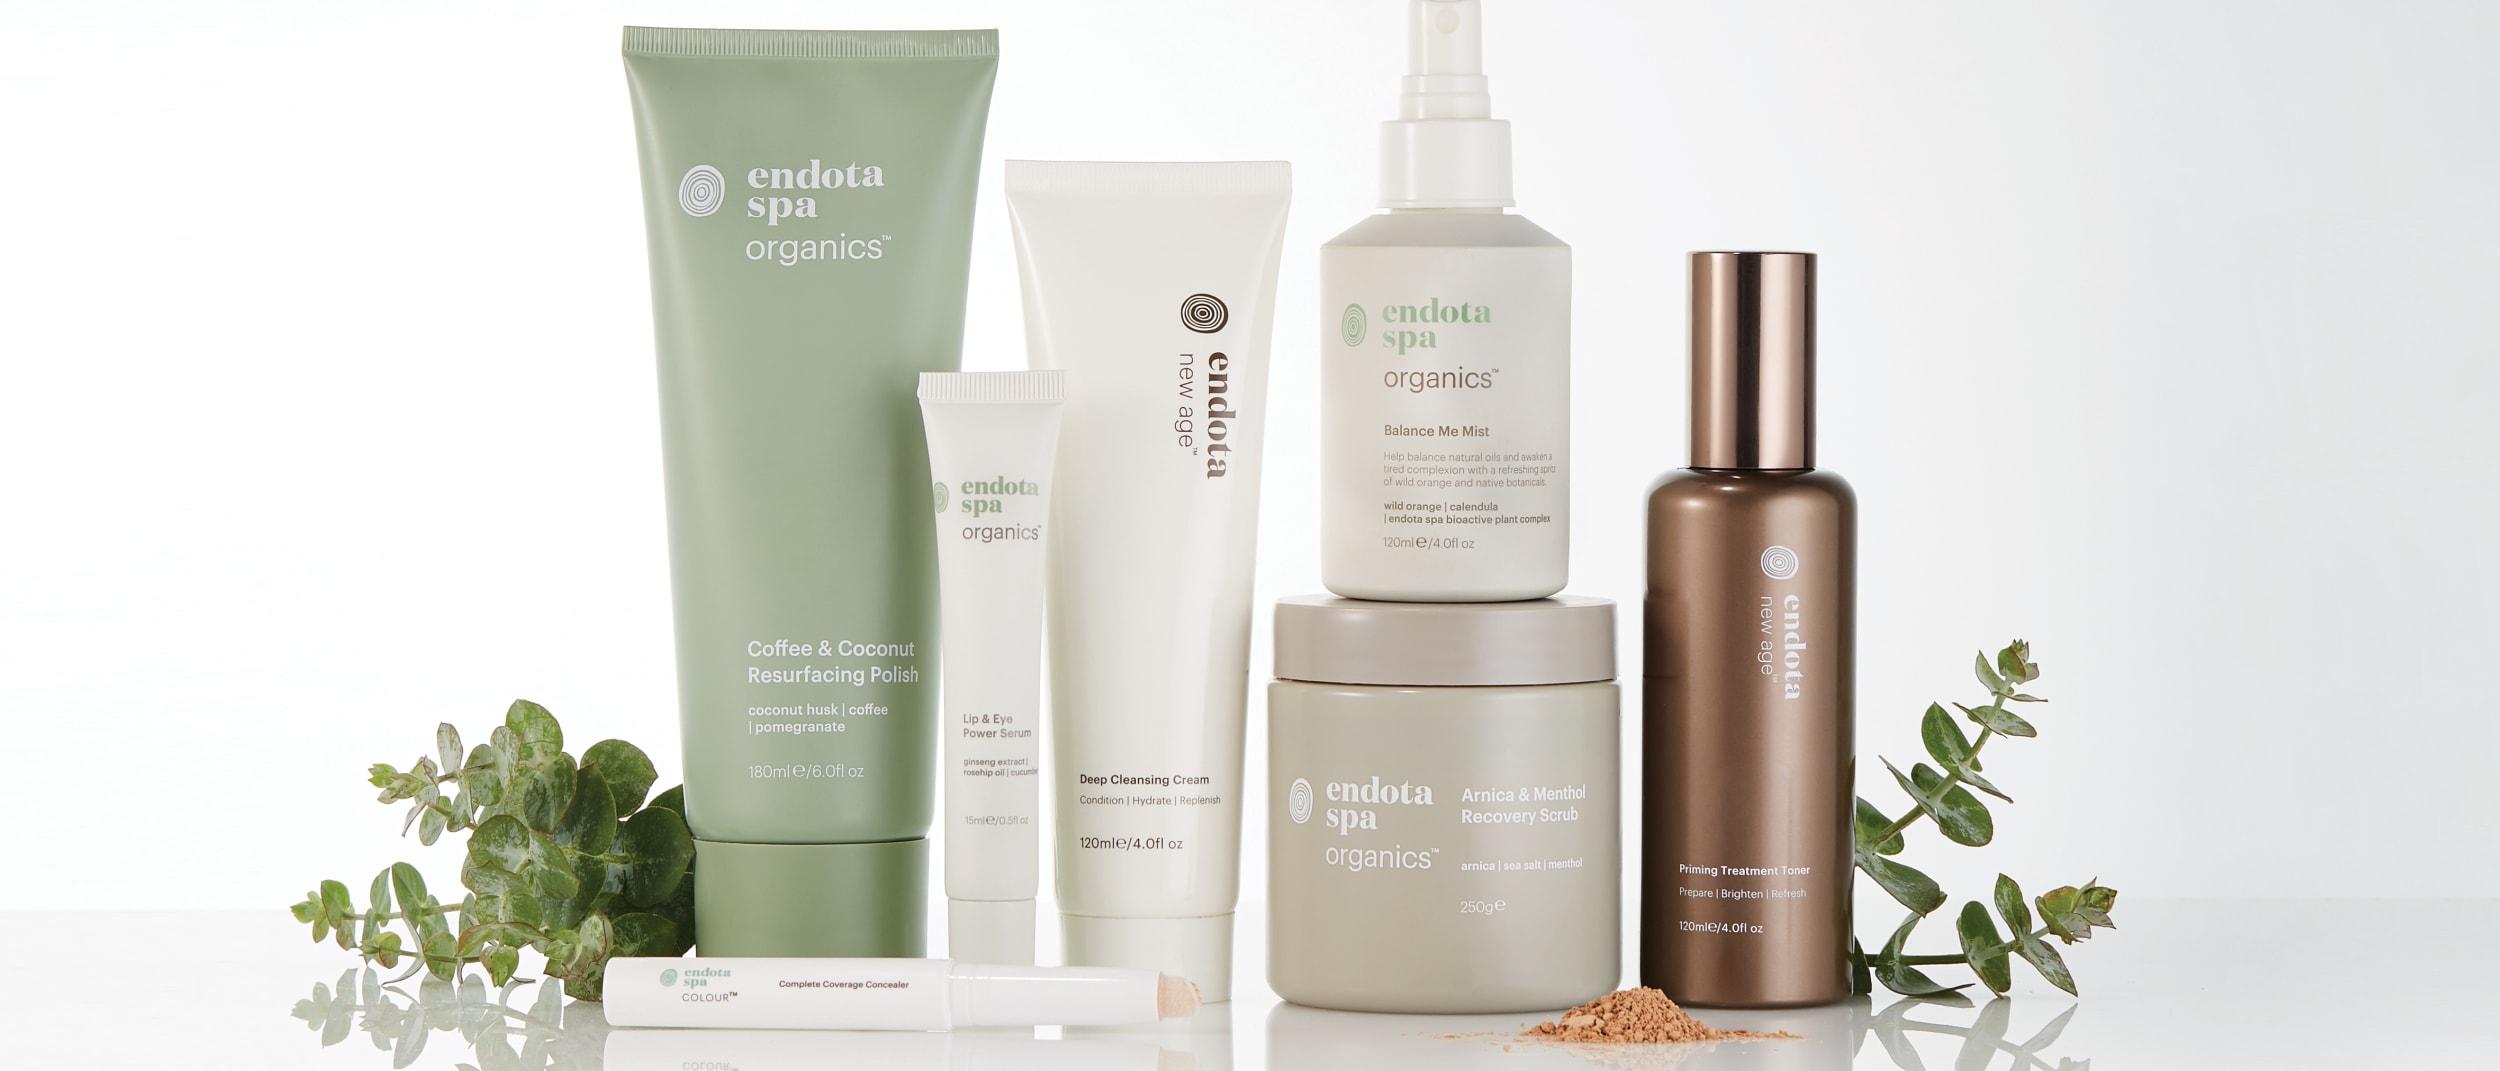 Endota: Enjoy 20% off skincare range